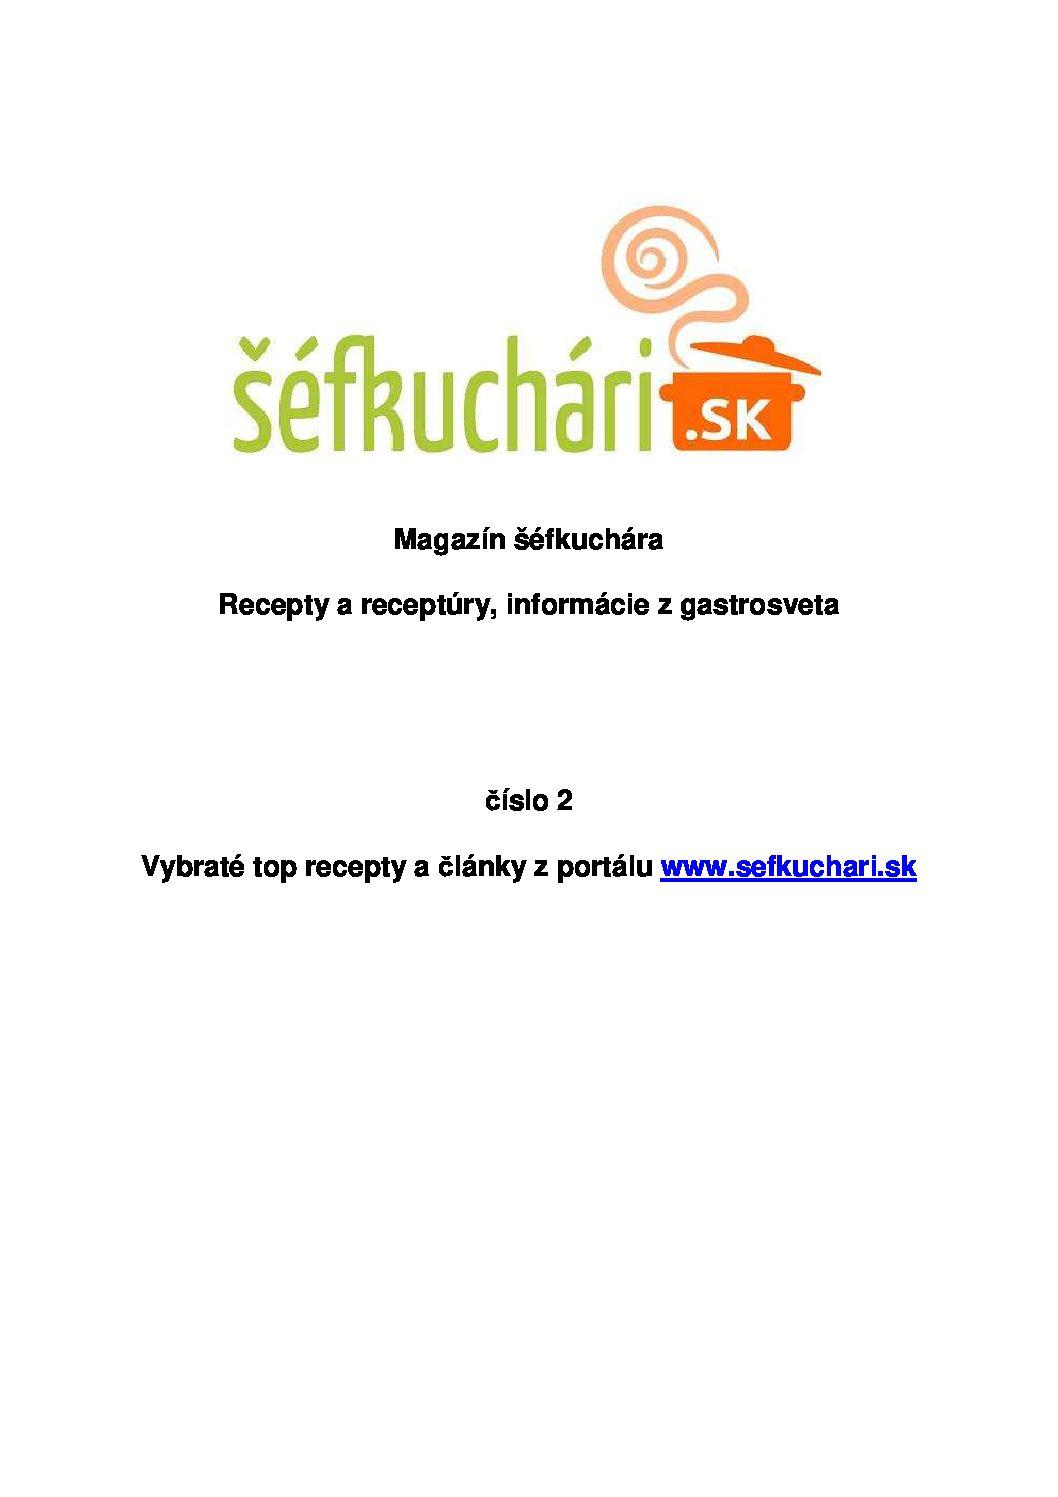 sfk 002 vybrane recepty pdf